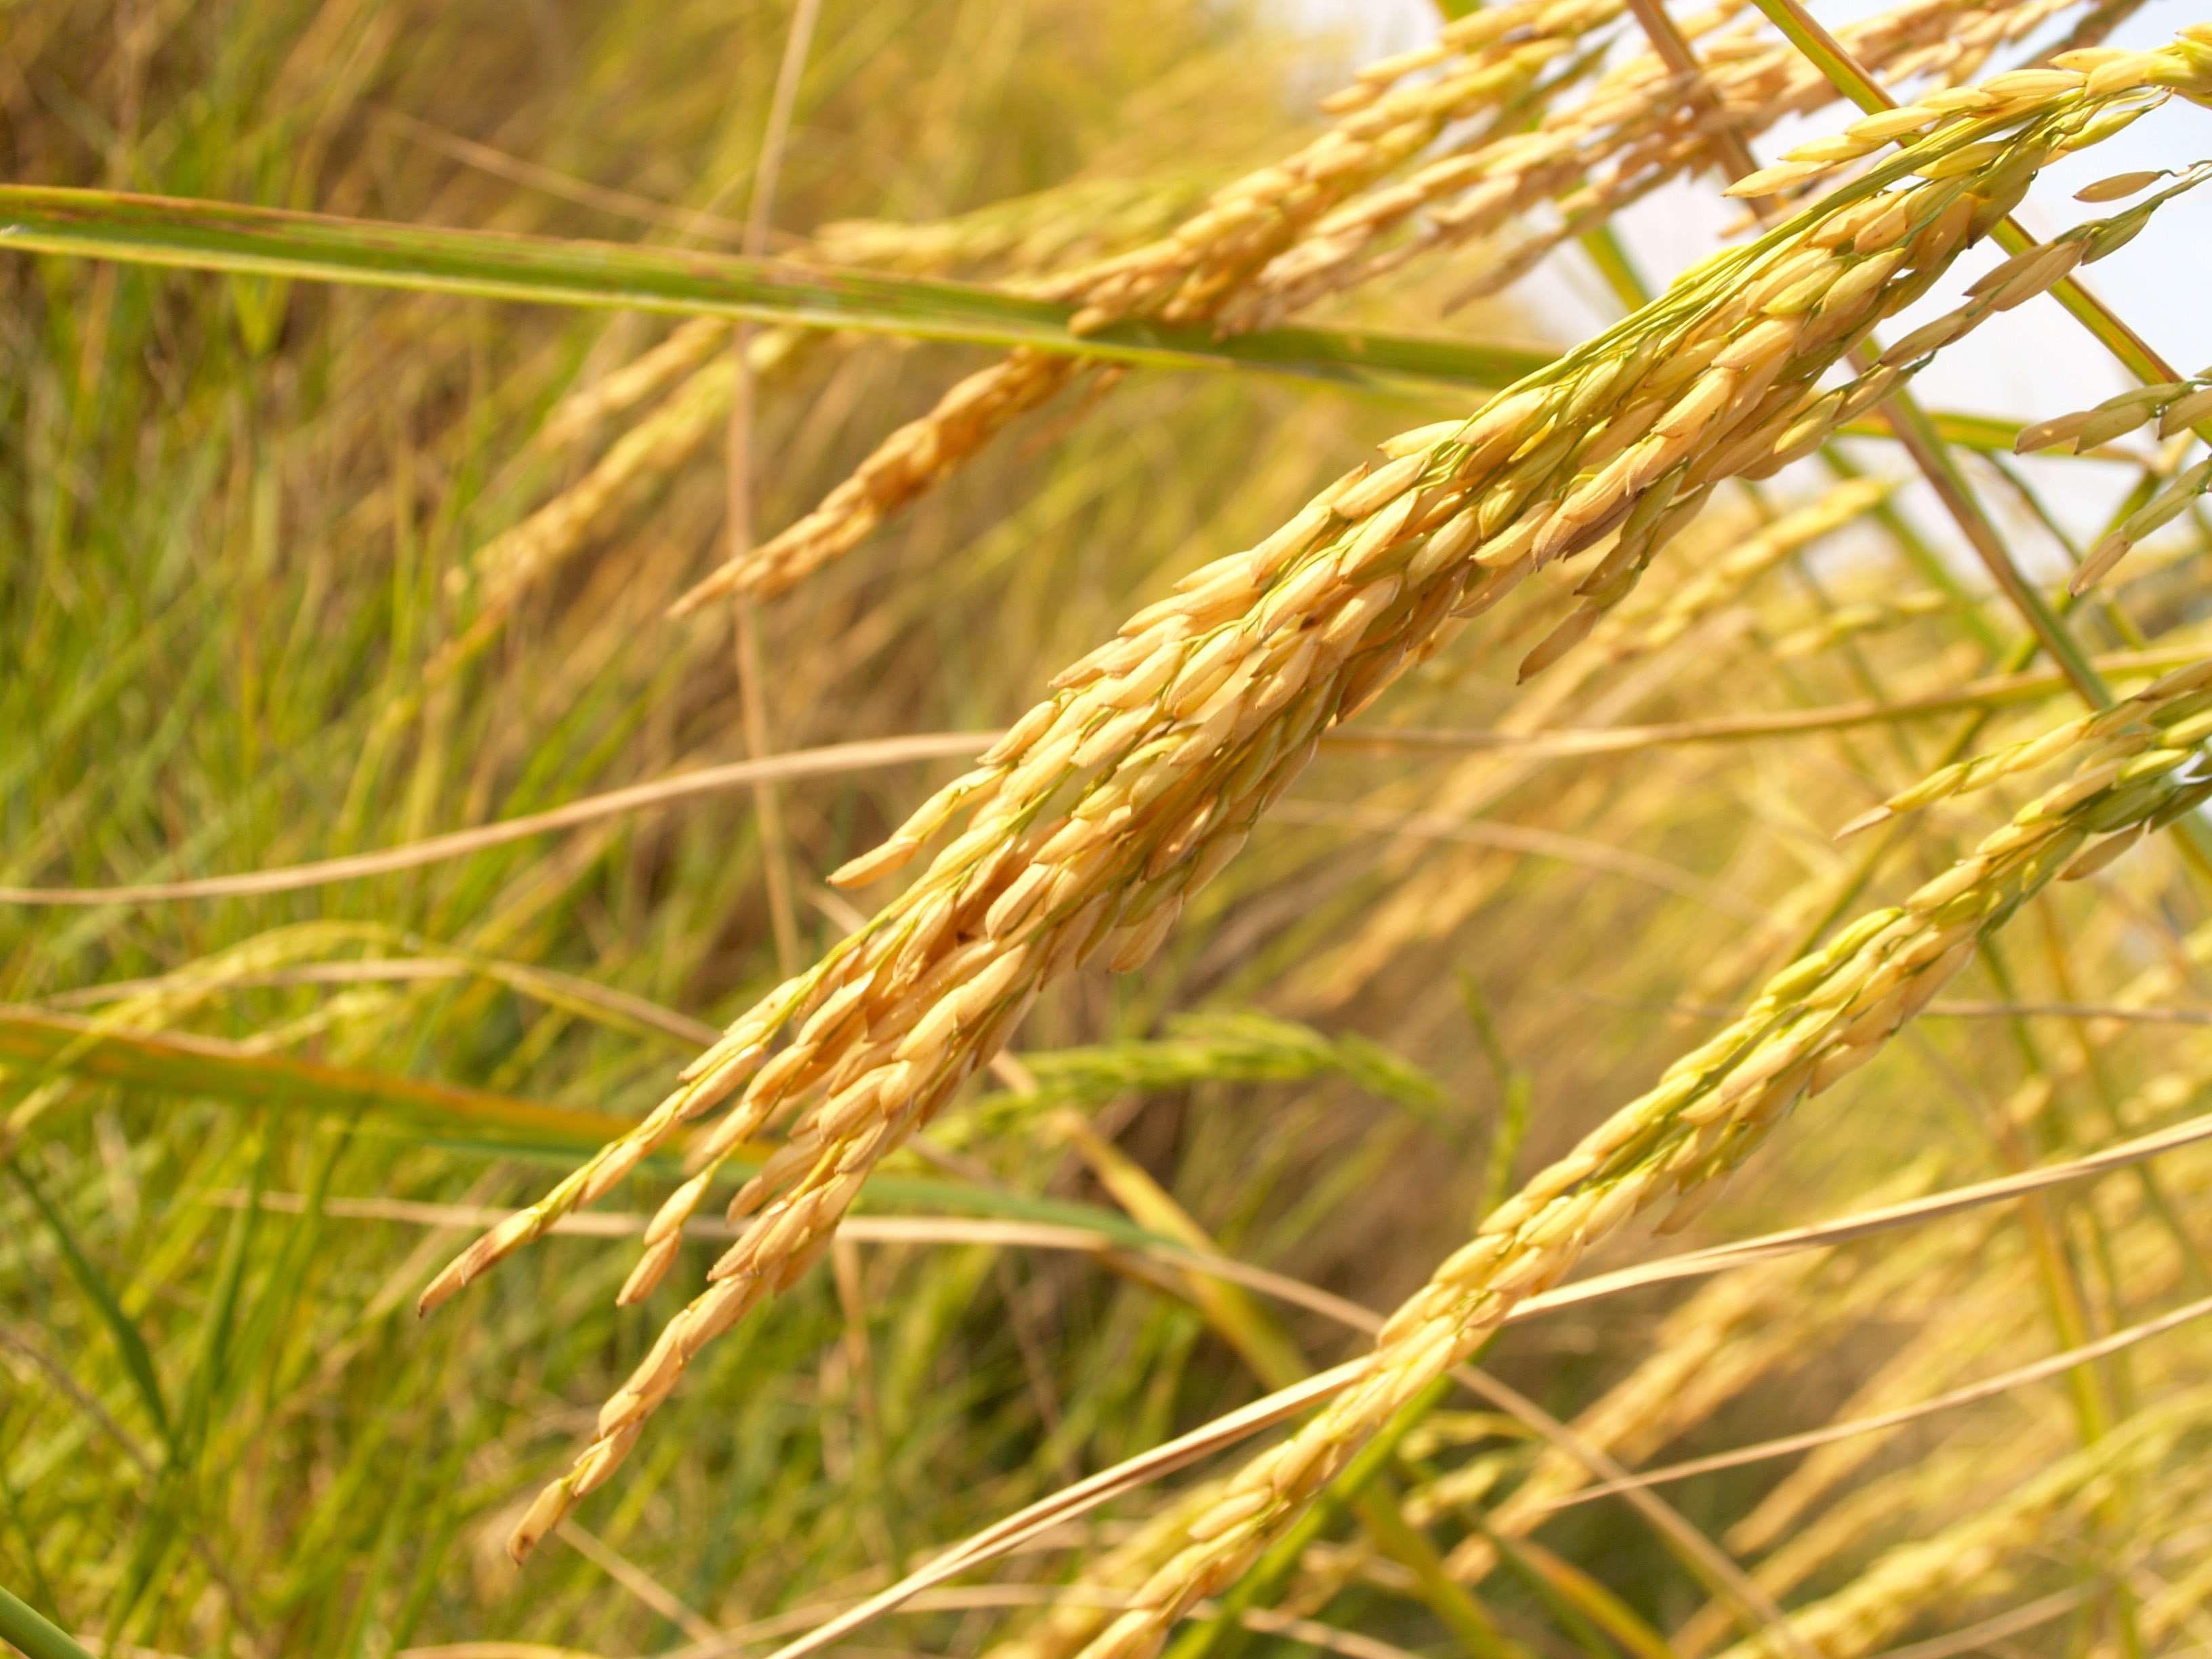 Agriculture Blur Close Up Crops Dry Farm Food Grains Grass